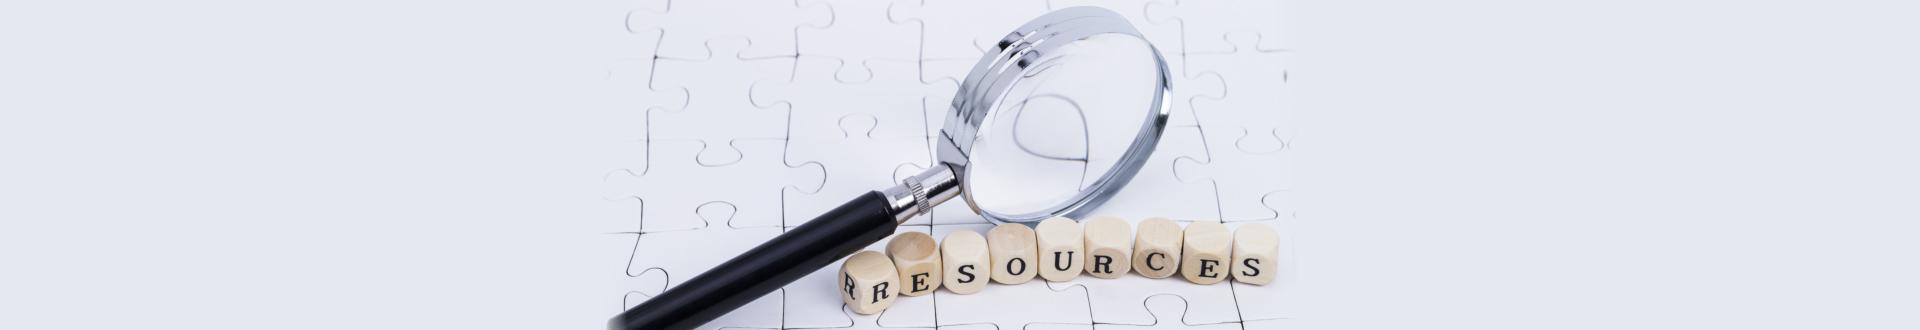 Resources concept